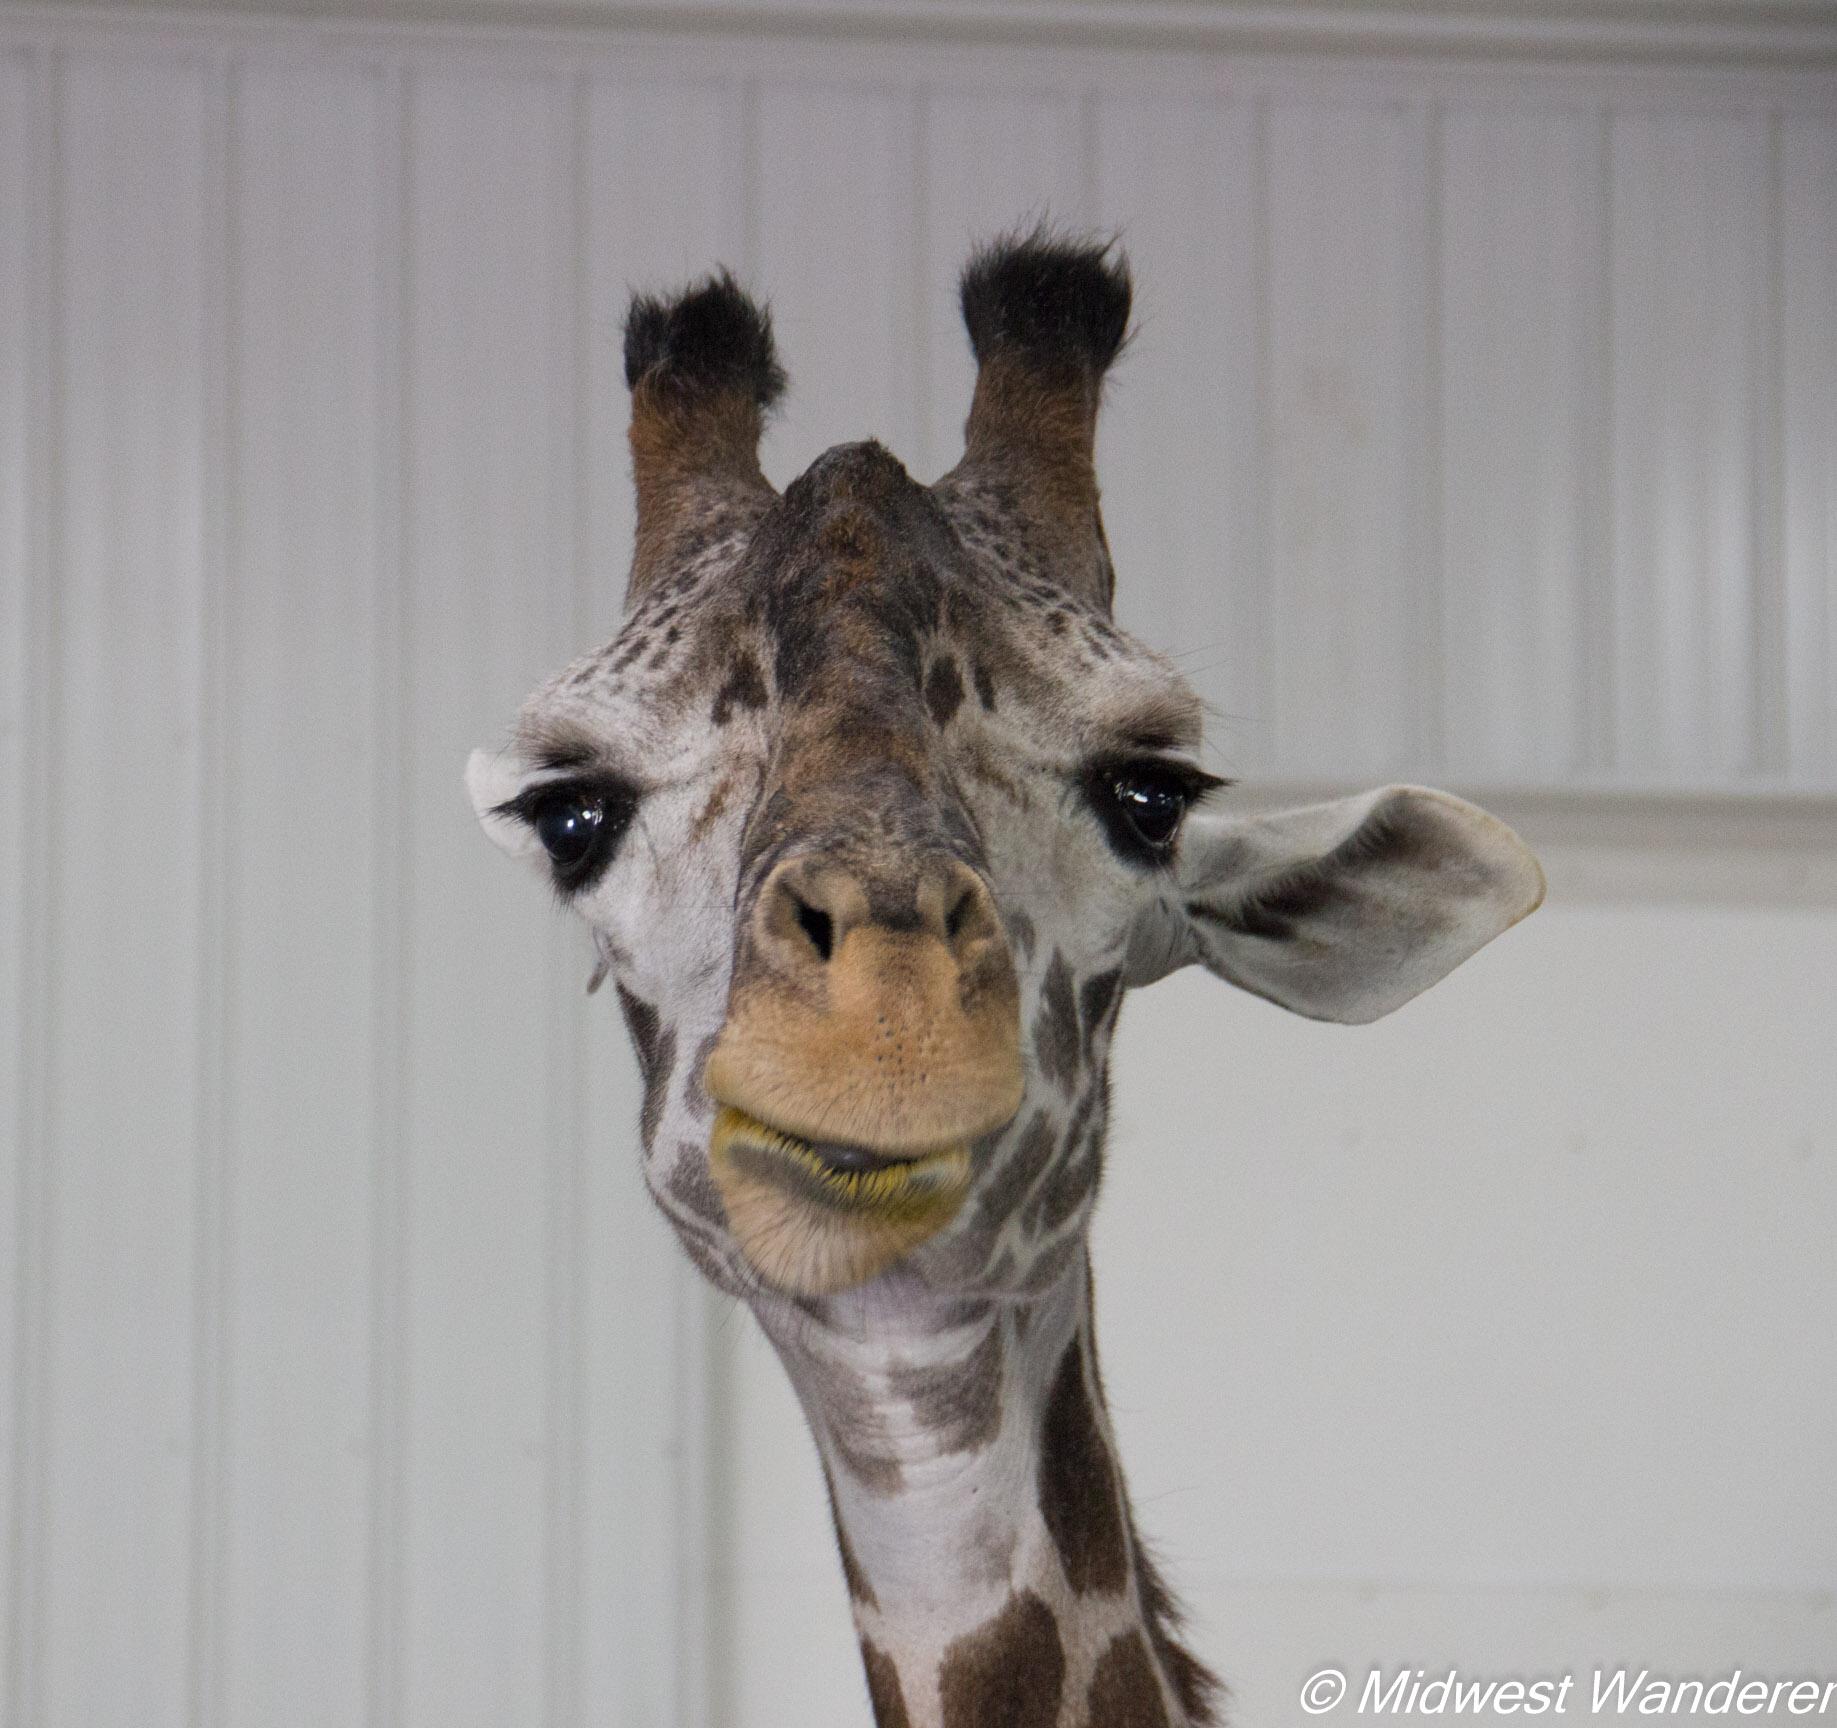 Wilstem Ranch Giraffe Encounter 2